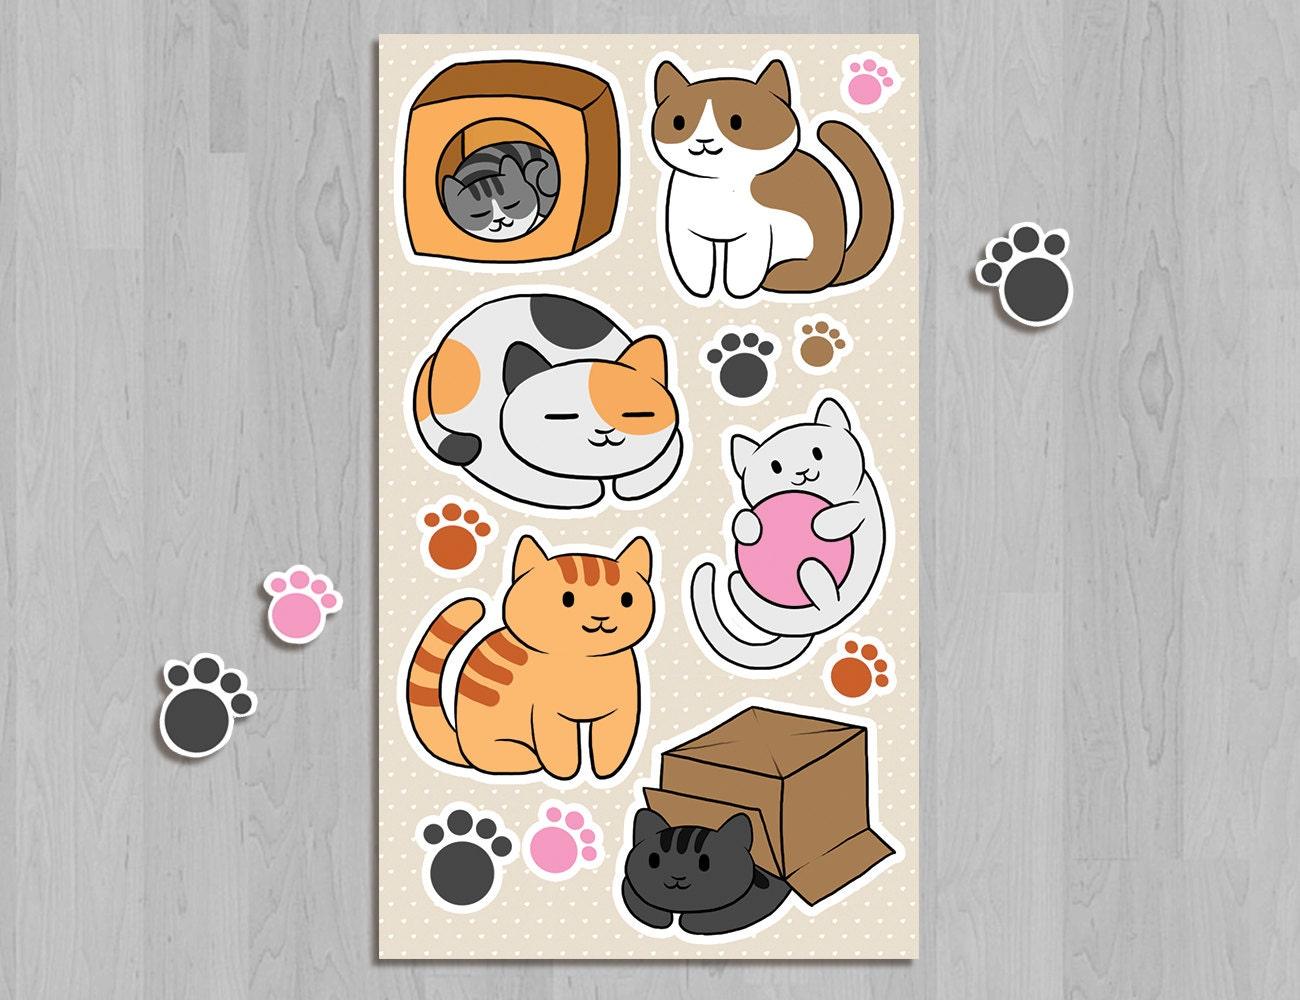 neko atsume sticker sheet kitty collector chibi cat app game